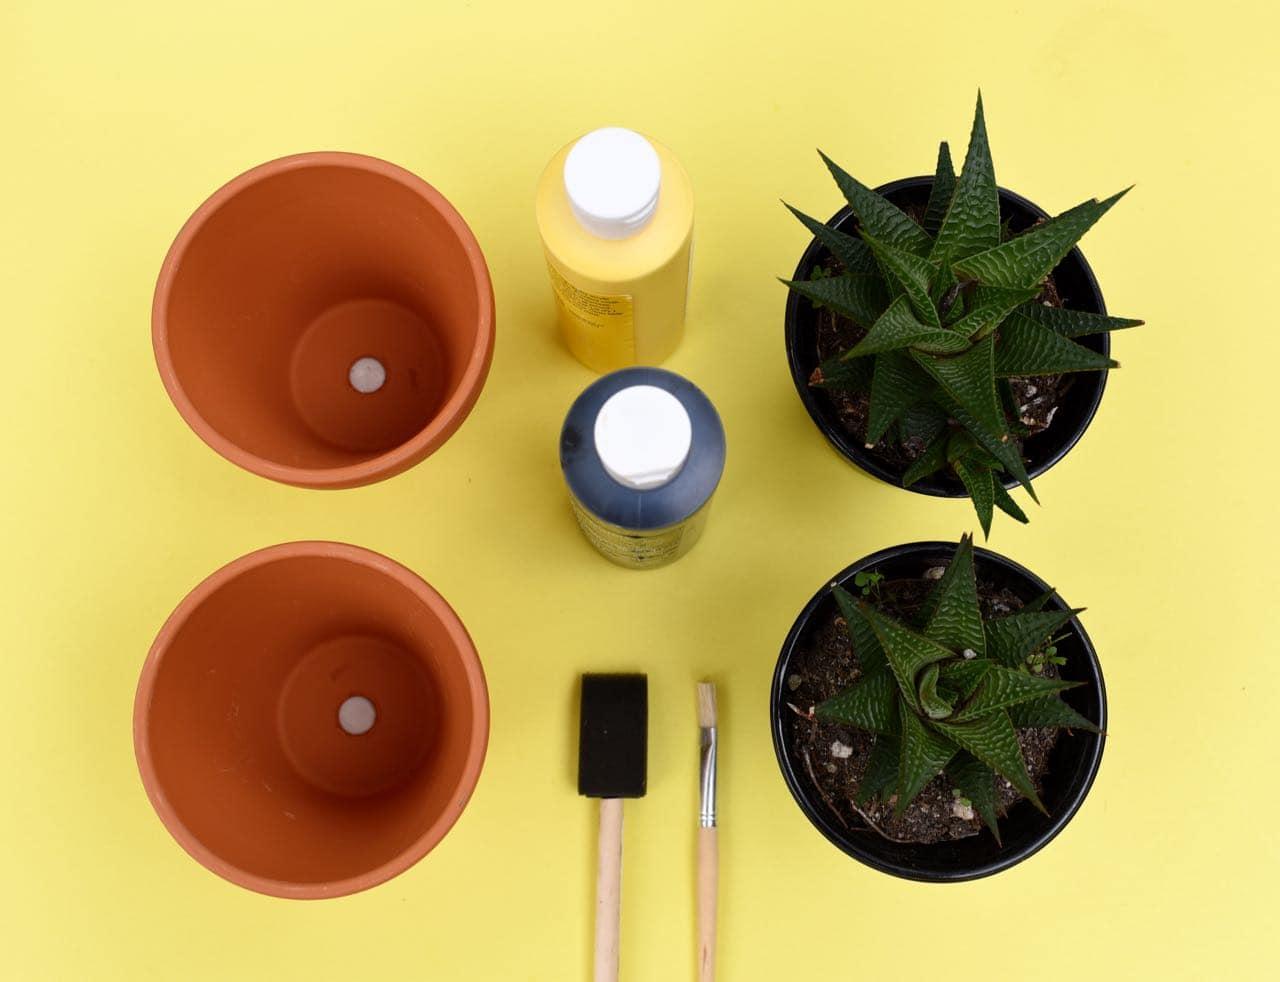 DIY pineapple planter supplies